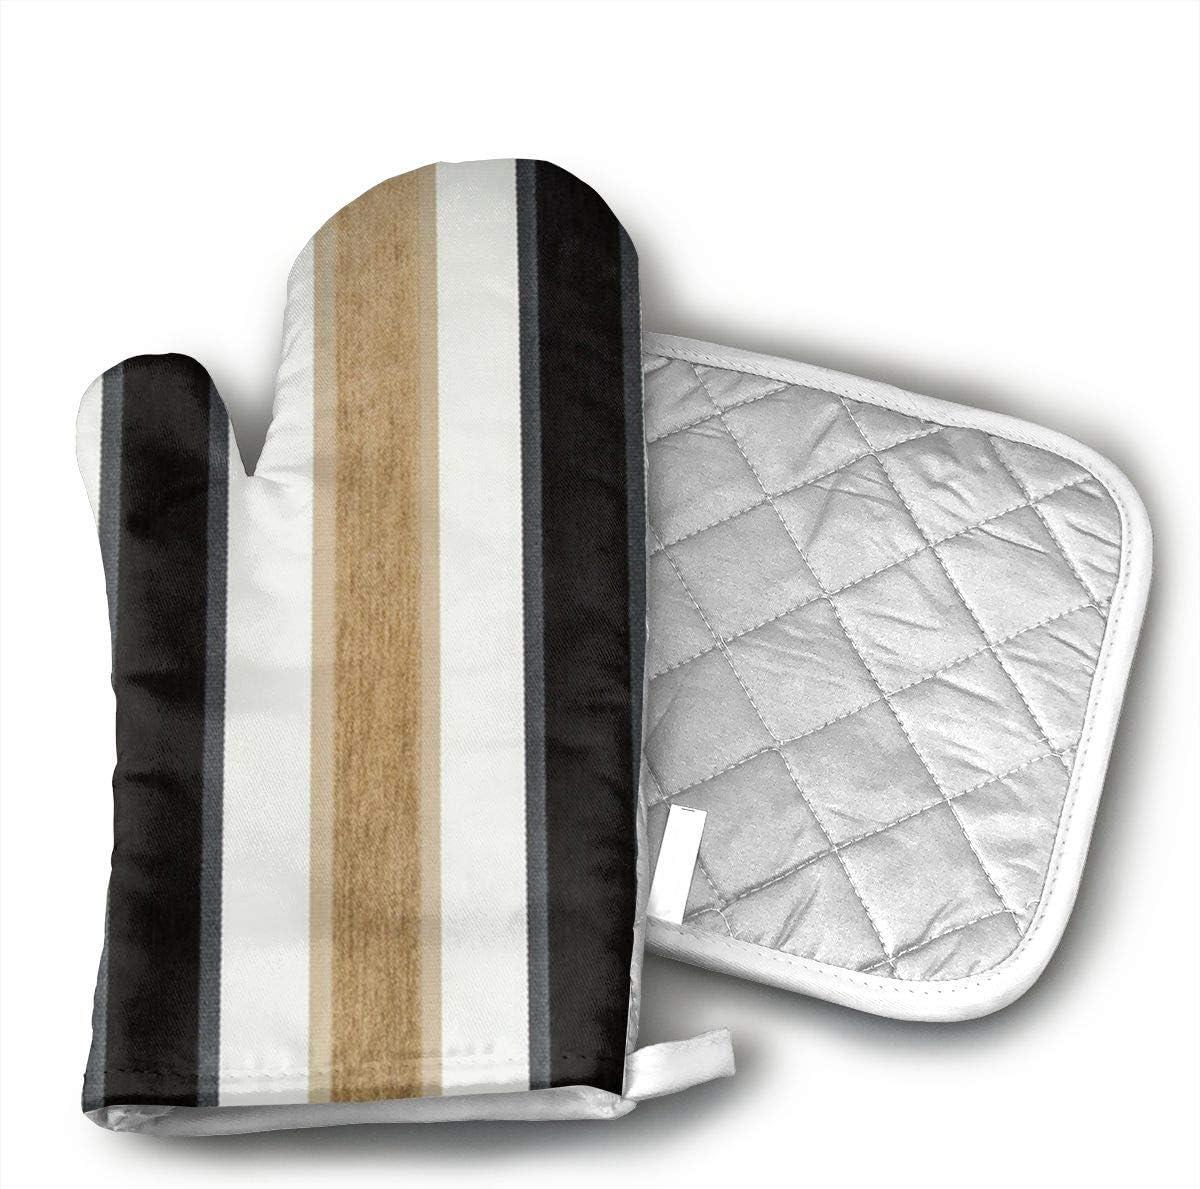 BGDEIOKJ Black Taupe Brown White Stripe Oven Gloves Microwave Gloves Barbecue Gloves Kitchen Cooking Bake Heat Resistant Gloves Combination